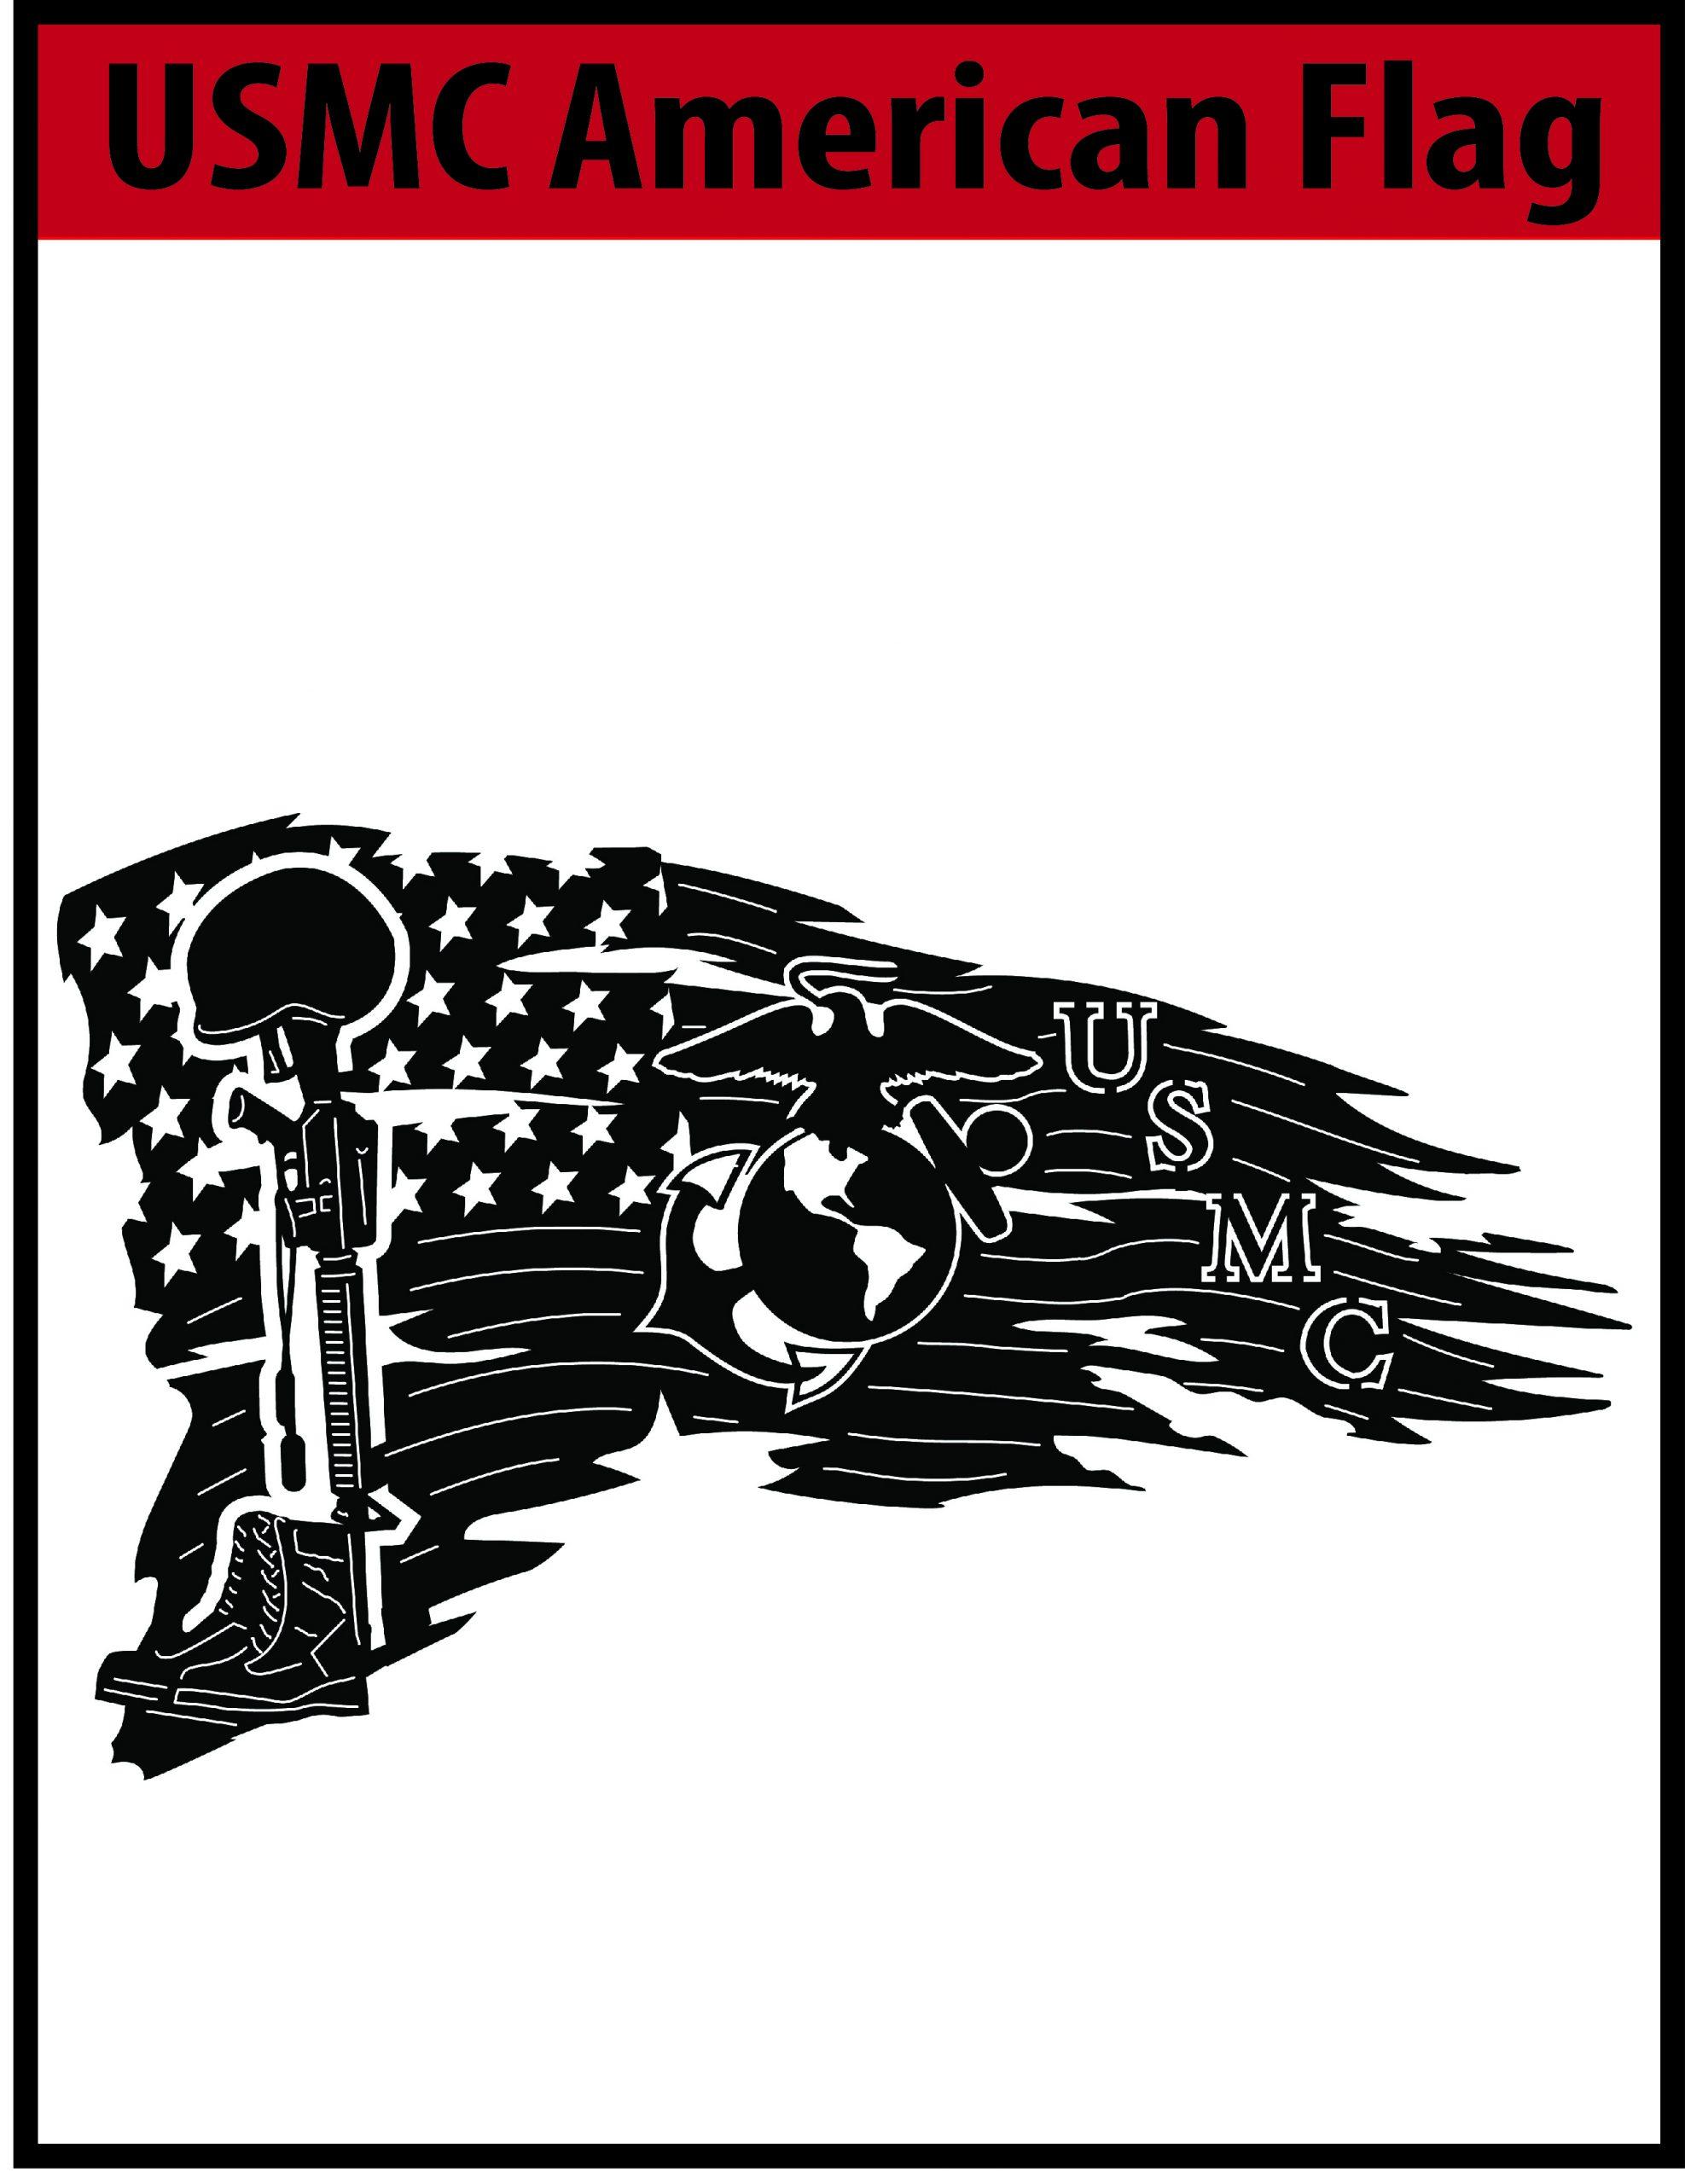 Usmc American Flag Free Dxf File Cnc Dxf Files